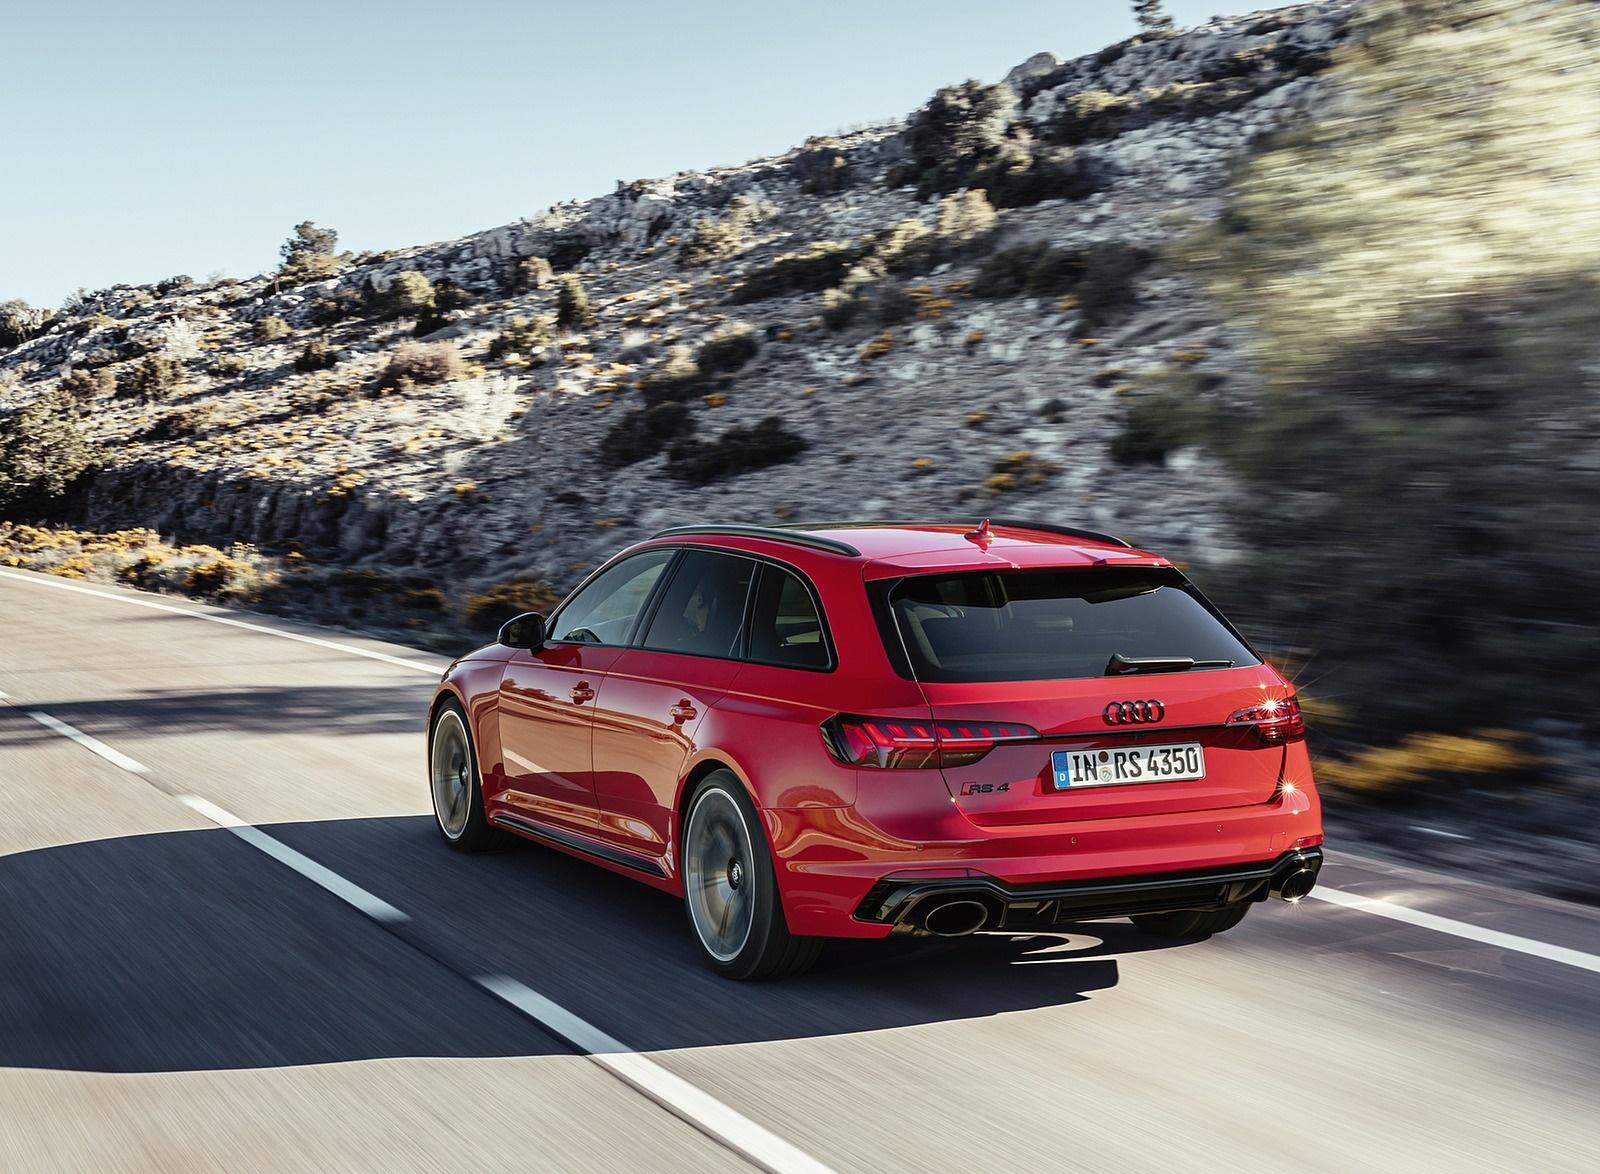 2020 Audi RS 4 Avant (Color: Tango Red) Rear Three-Quarter Wallpapers (8)